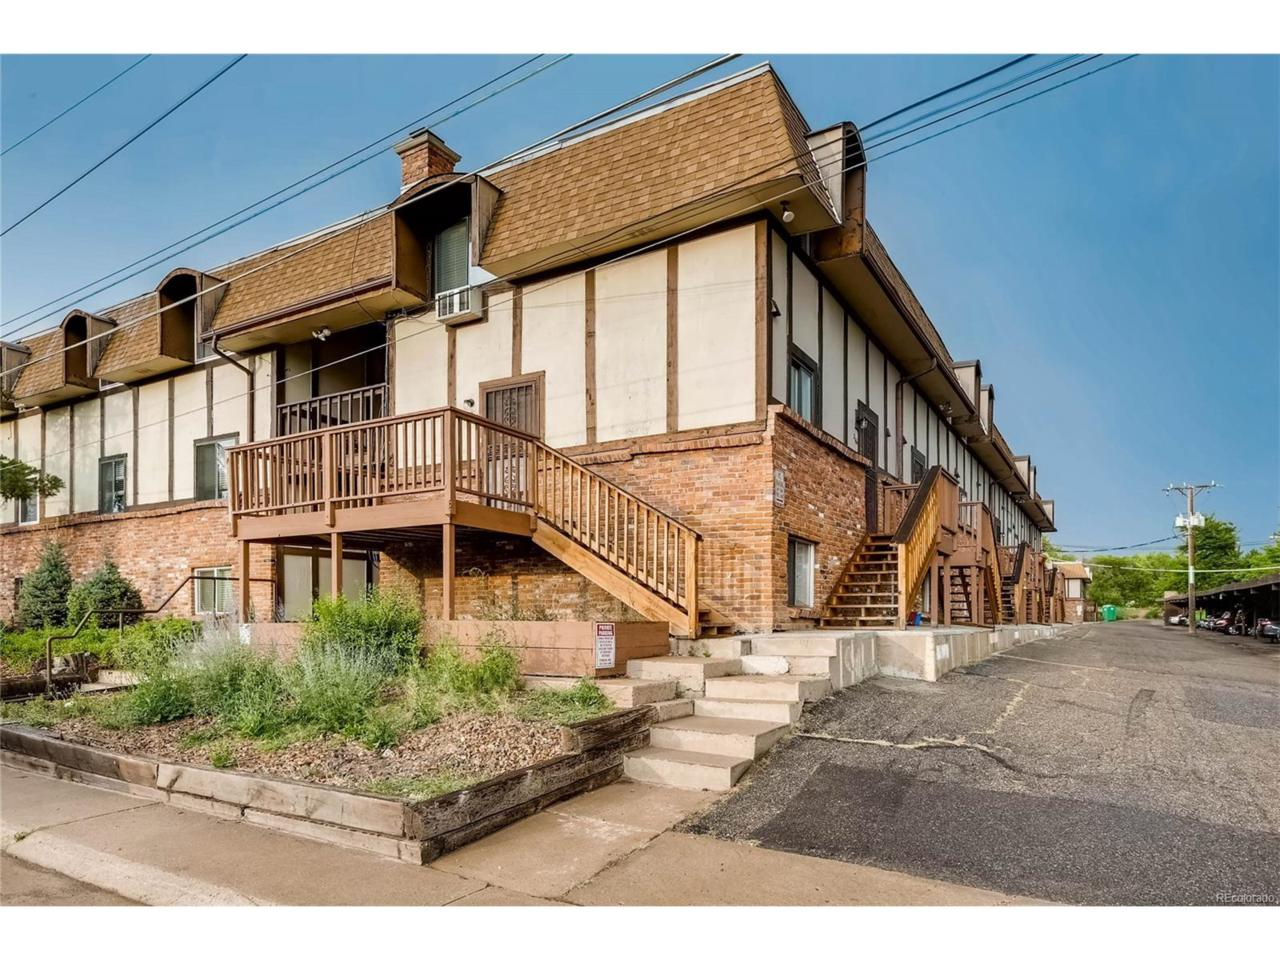 2700 S Holly Street #216, Denver, CO 80222 (MLS #4535109) :: 8z Real Estate